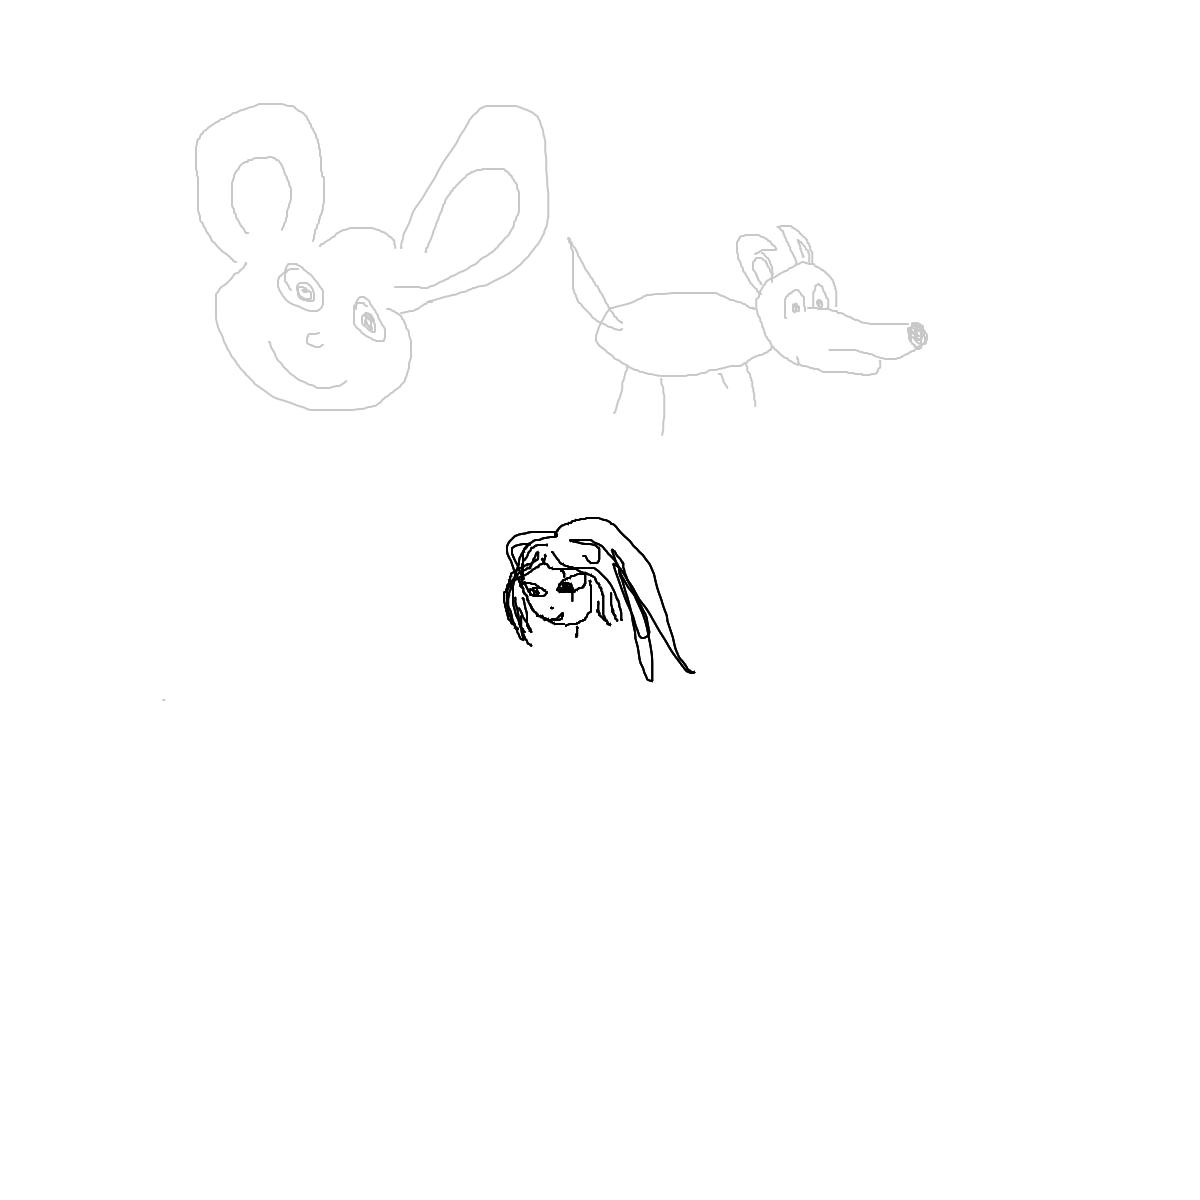 BAAAM drawing#22890 lat:44.9449653625488300lng: 8.4873905181884770